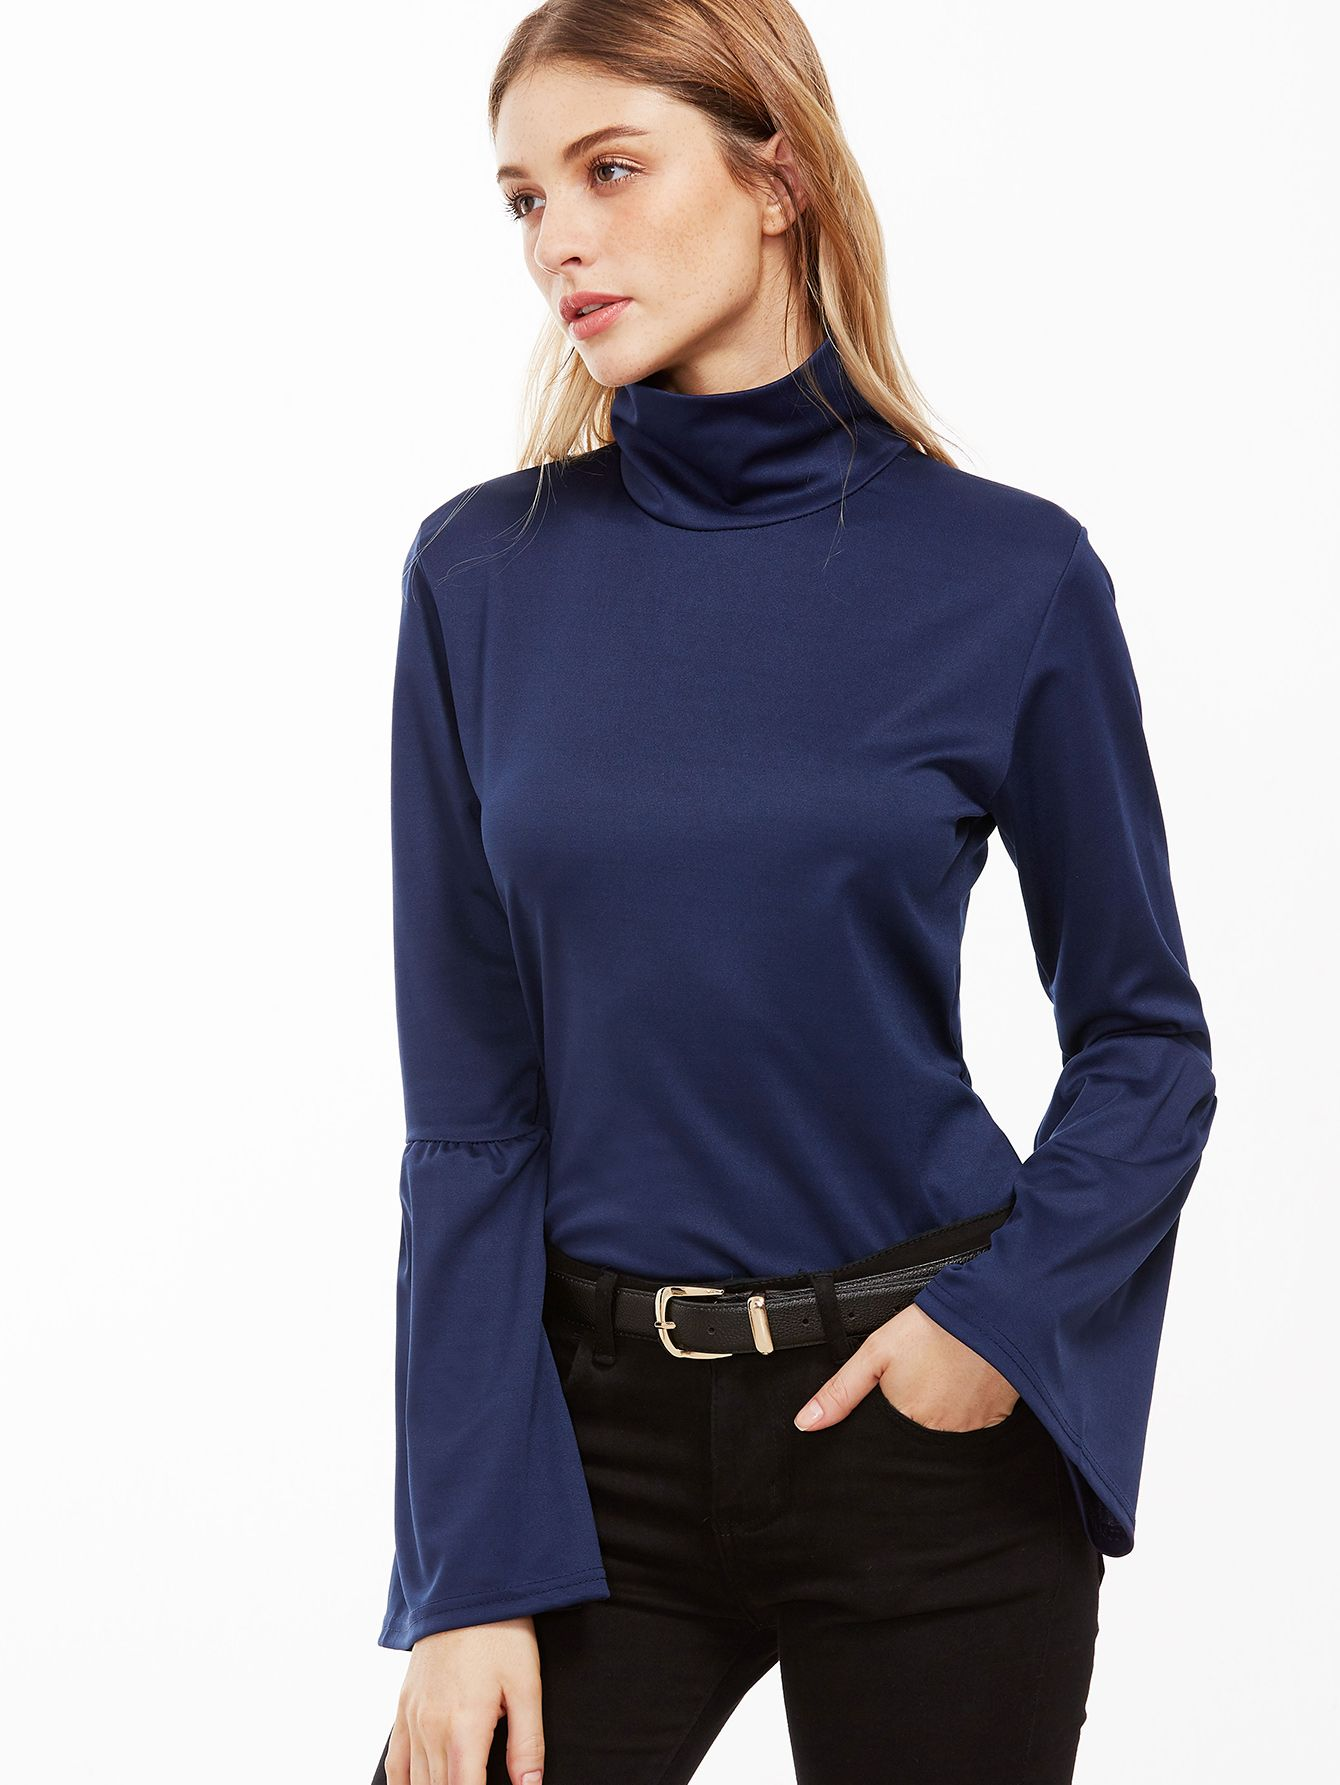 Navy High Neck Bell Sleeve Zipper Back T-shirt — 0.00 € ---------color: Navy size: M